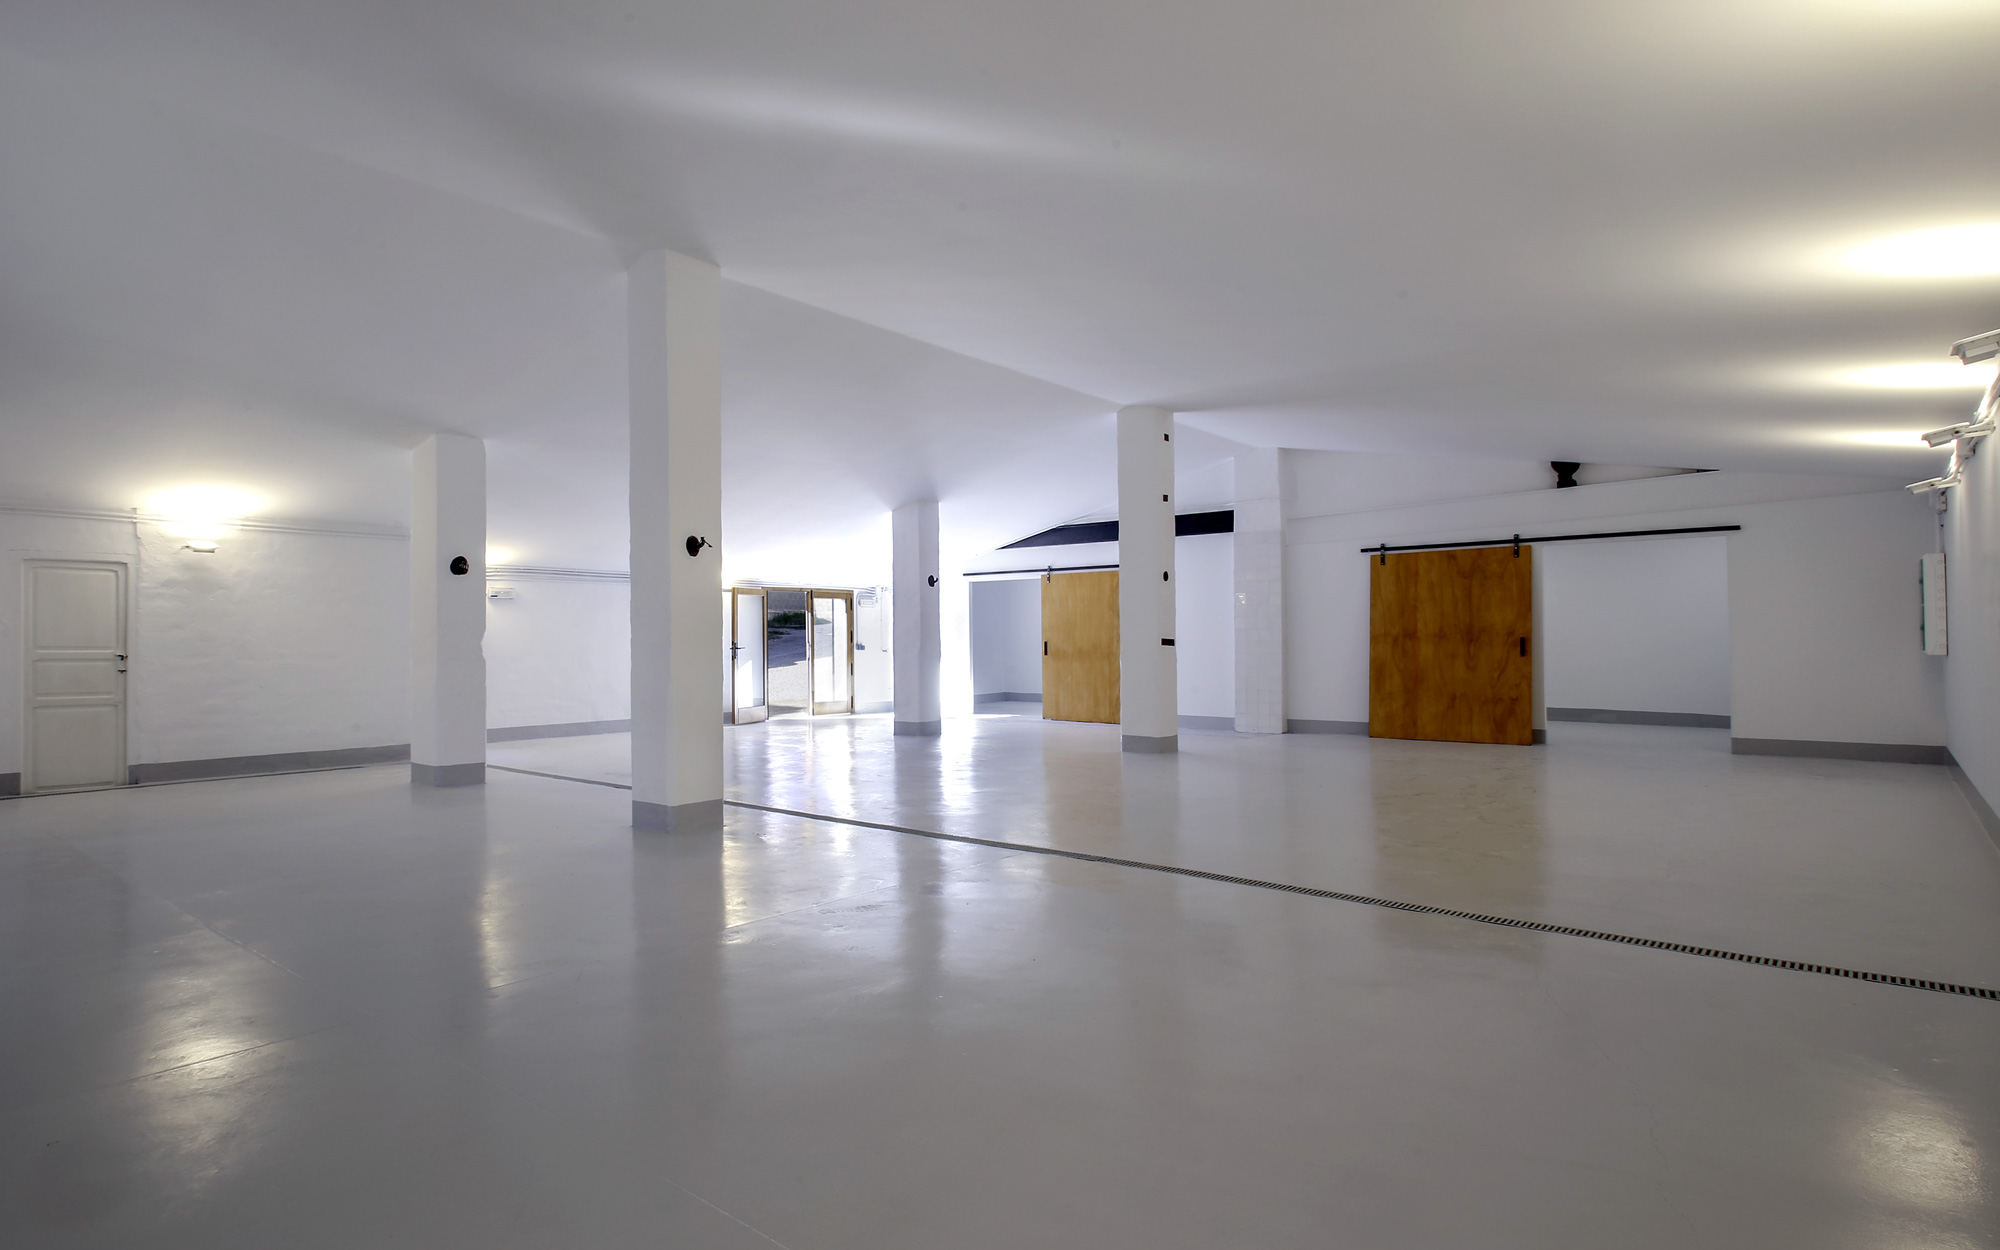 Vilaarquitectes estudio de arquitectura rehabilitaci n - Diseno de interiores valencia ...